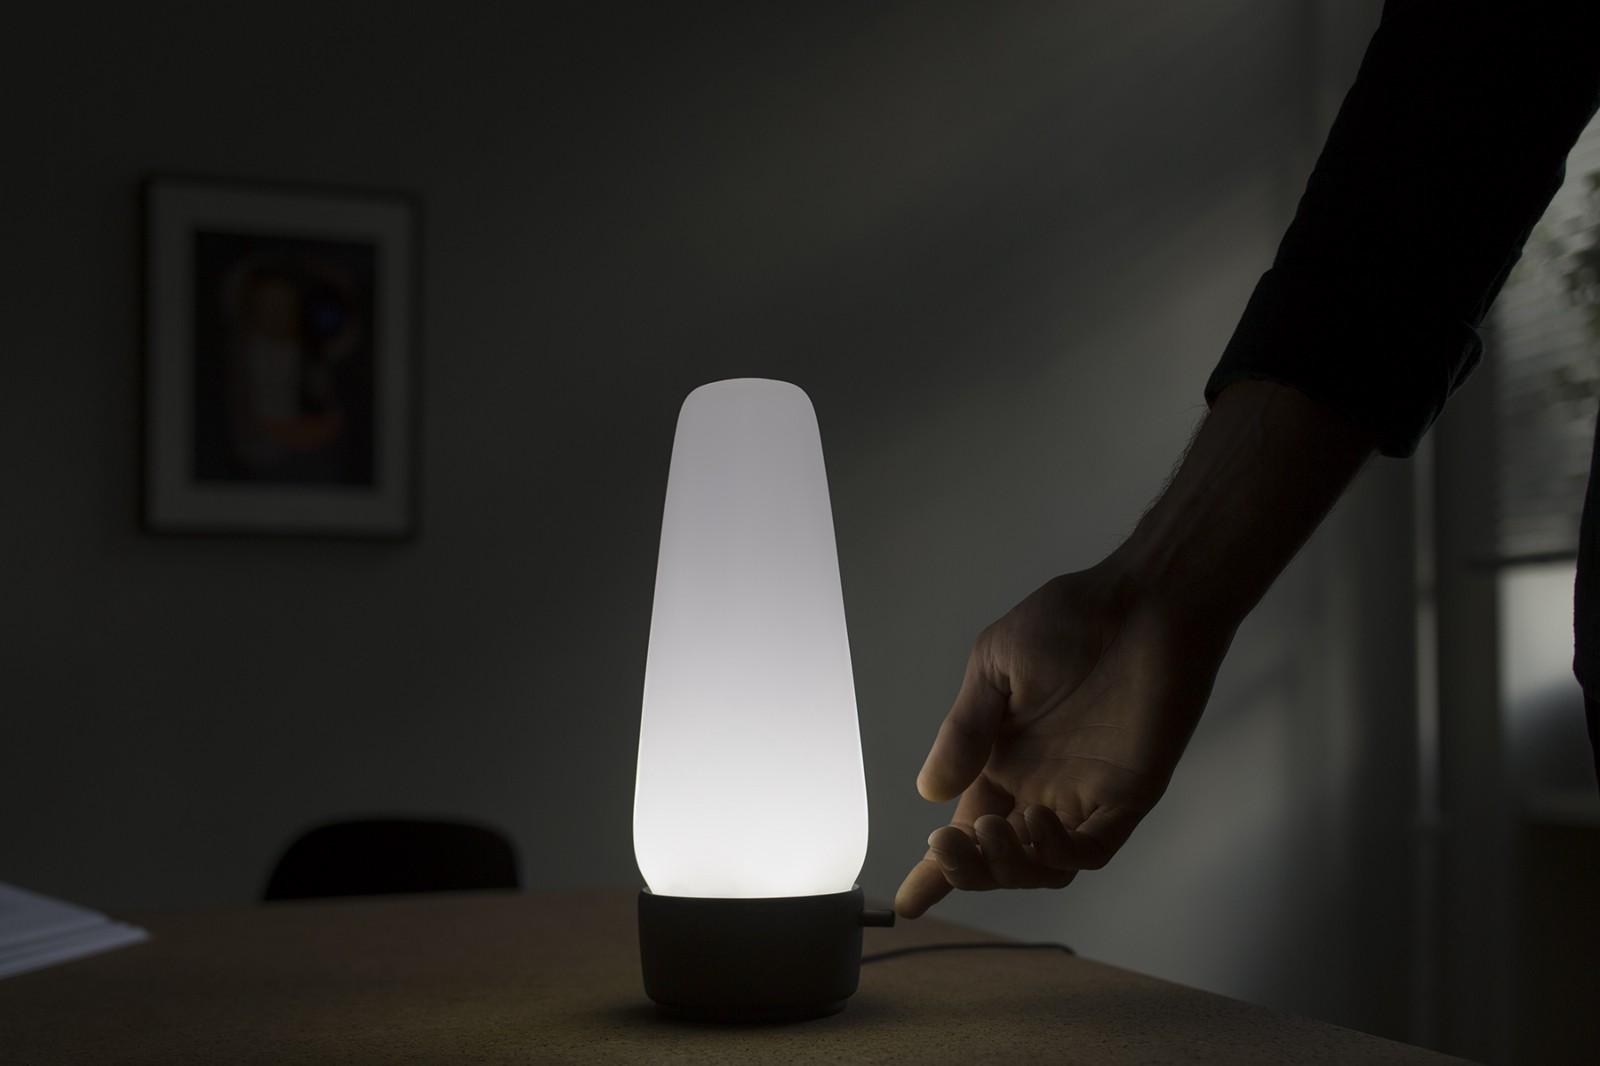 covi an open source speech enabled smart home hub on. Black Bedroom Furniture Sets. Home Design Ideas